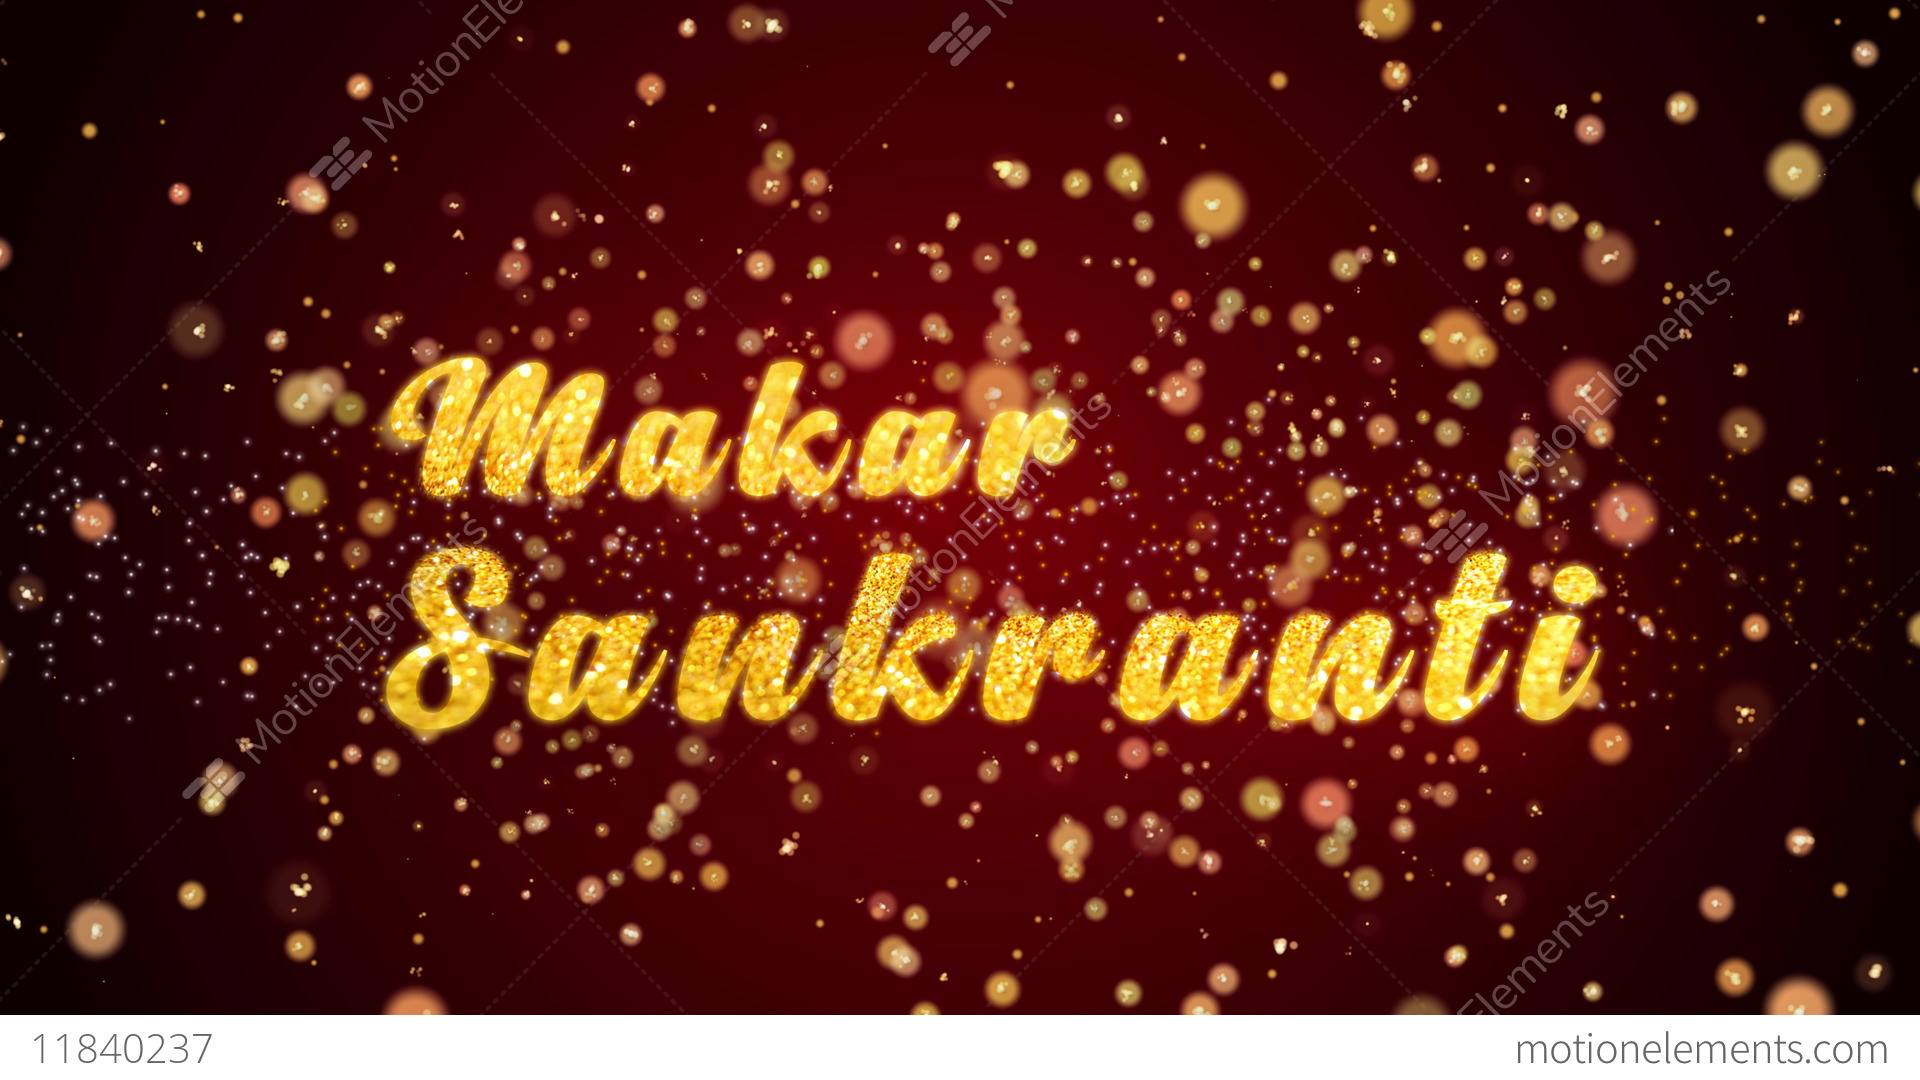 Makar sankranti greeting card text shiny particles for celebration makar sankranti greeting card text shiny particles for stock video footage m4hsunfo